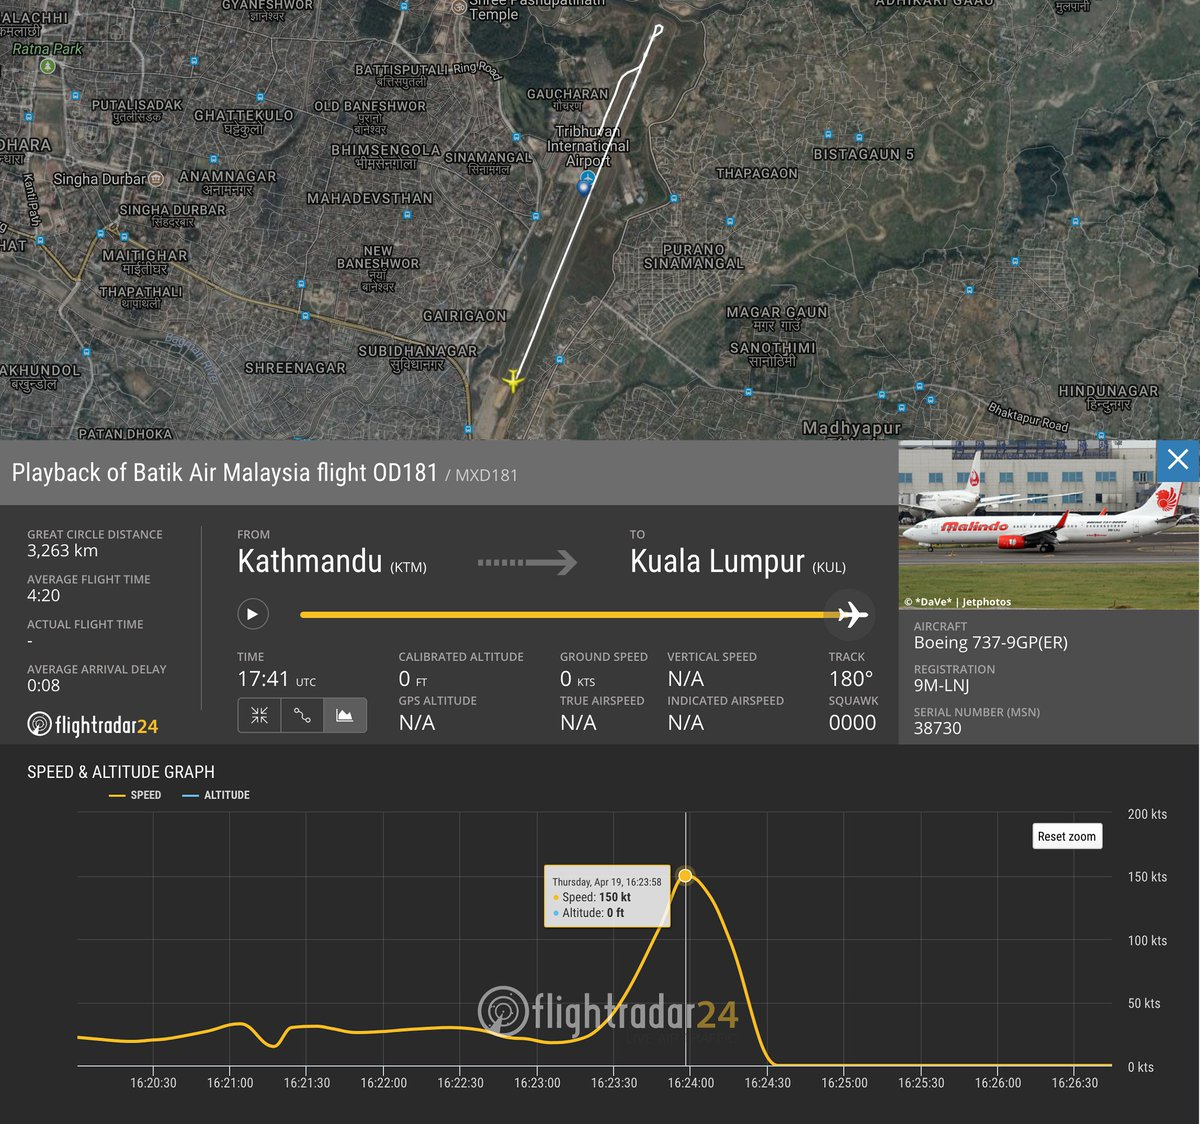 It appears #OD181 from Kathmandu to Kuala Lumpur experienced a runway excursion on takeoff at Kathmandu. https://t.co/GpTvjPiPML  🕵️@kundadixit